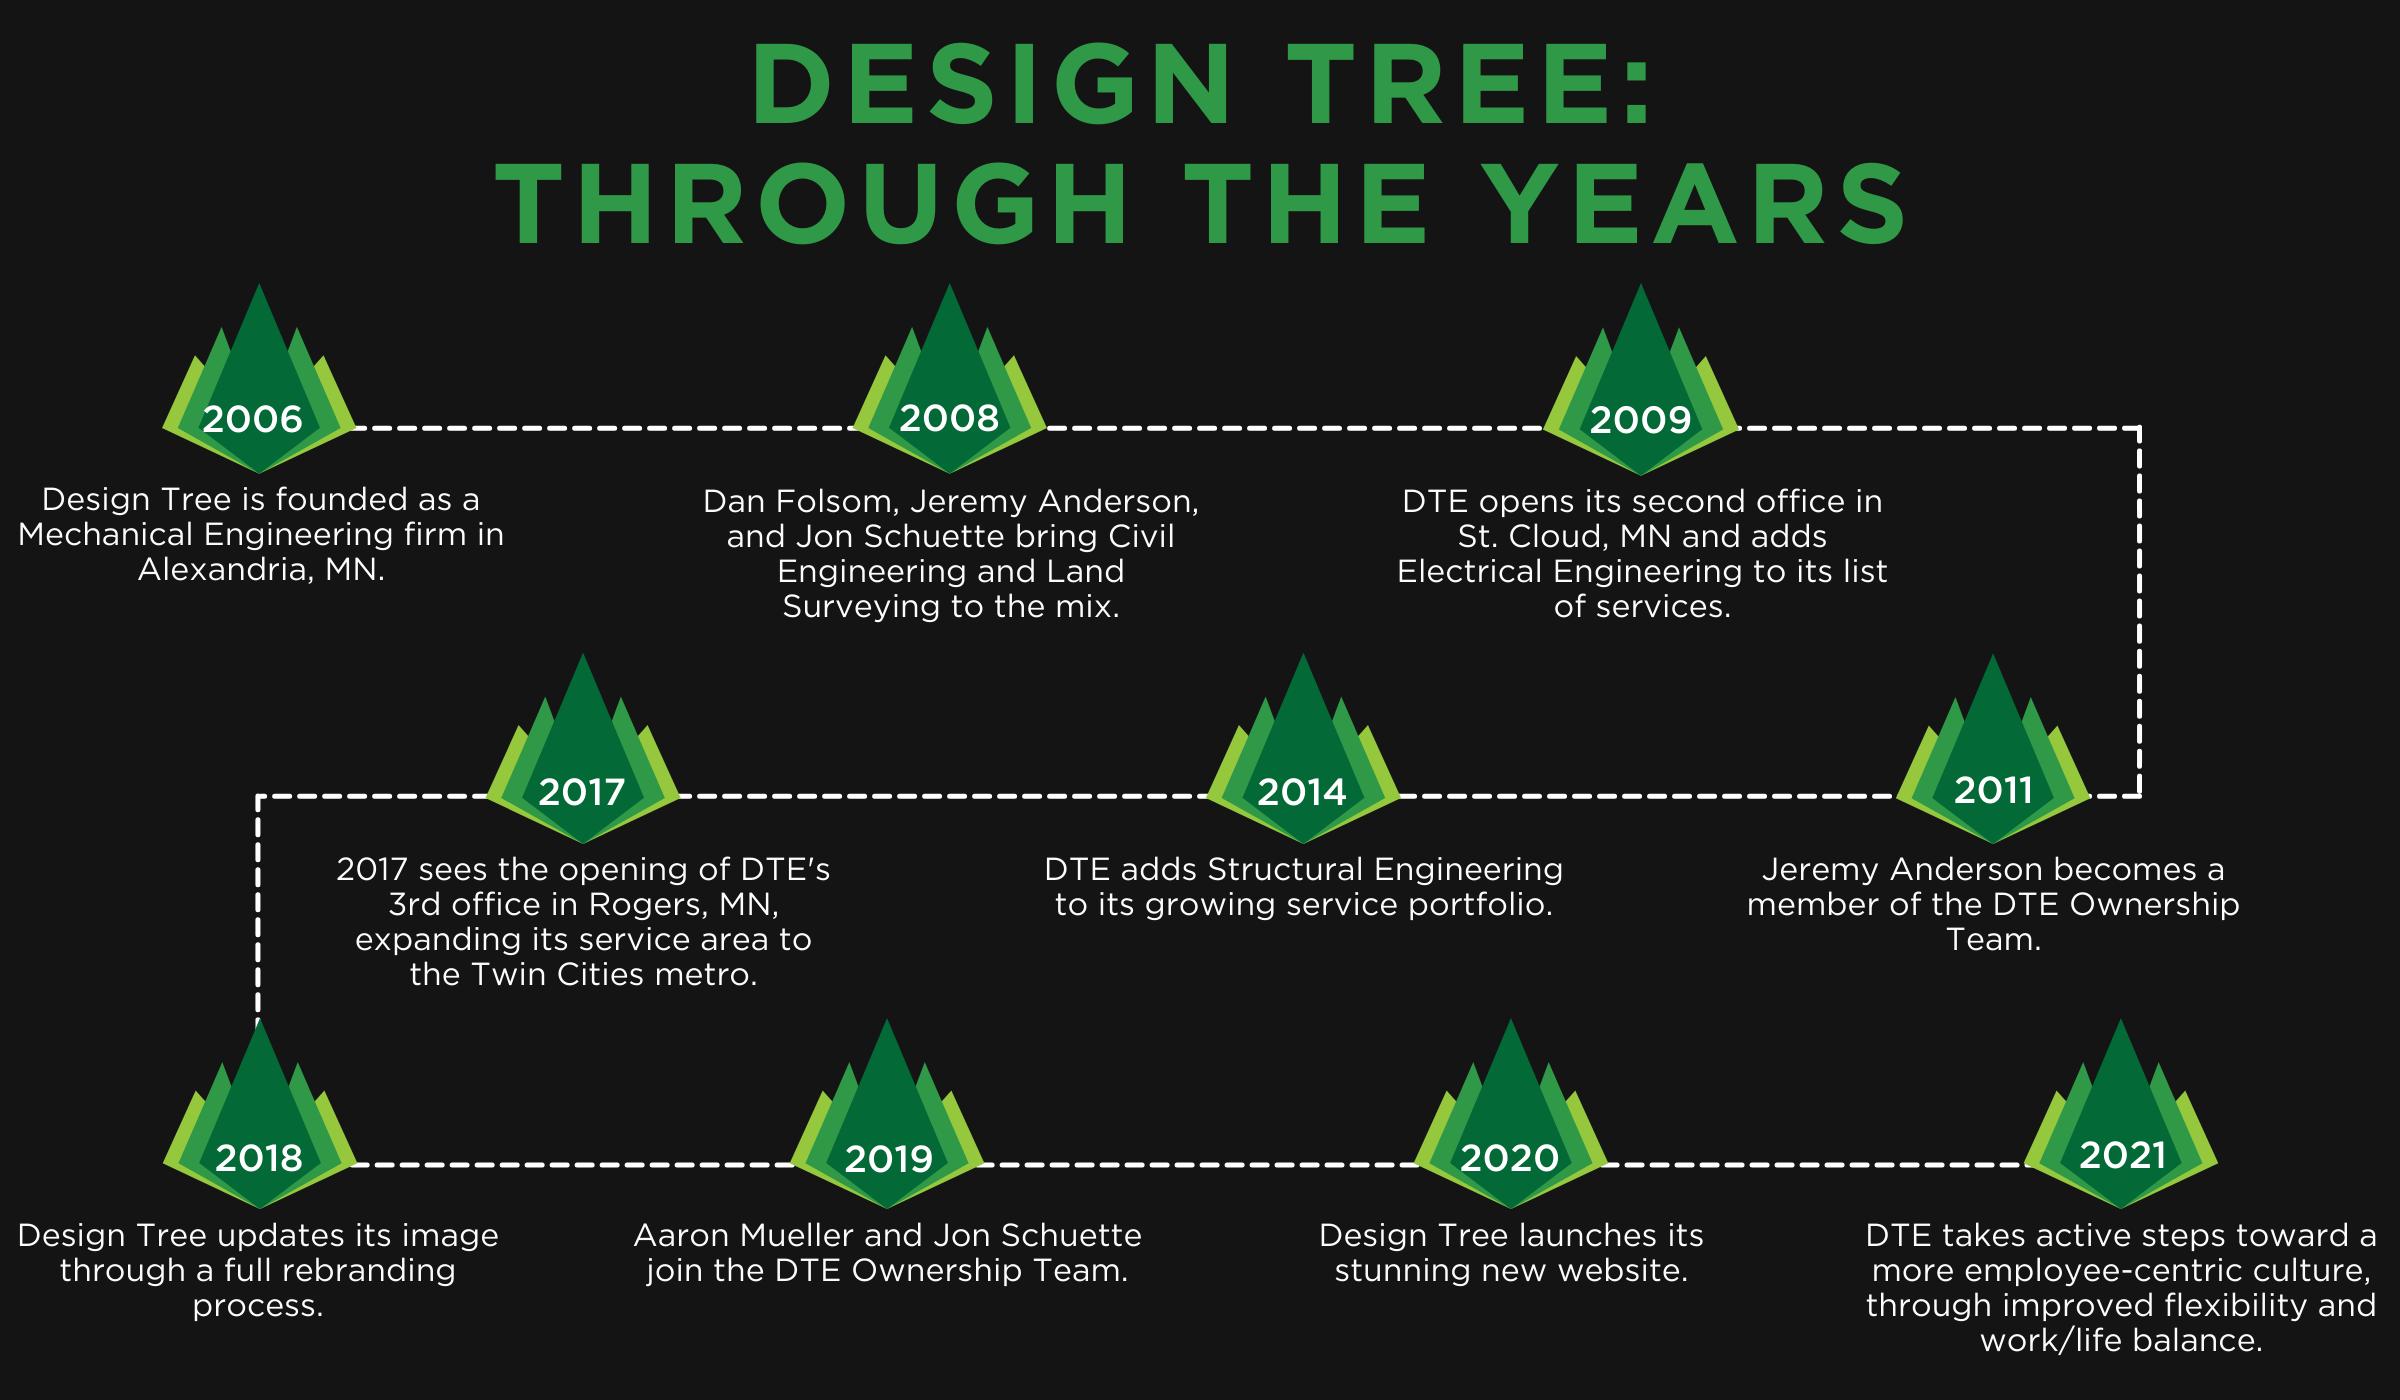 Design Tree History Timeline